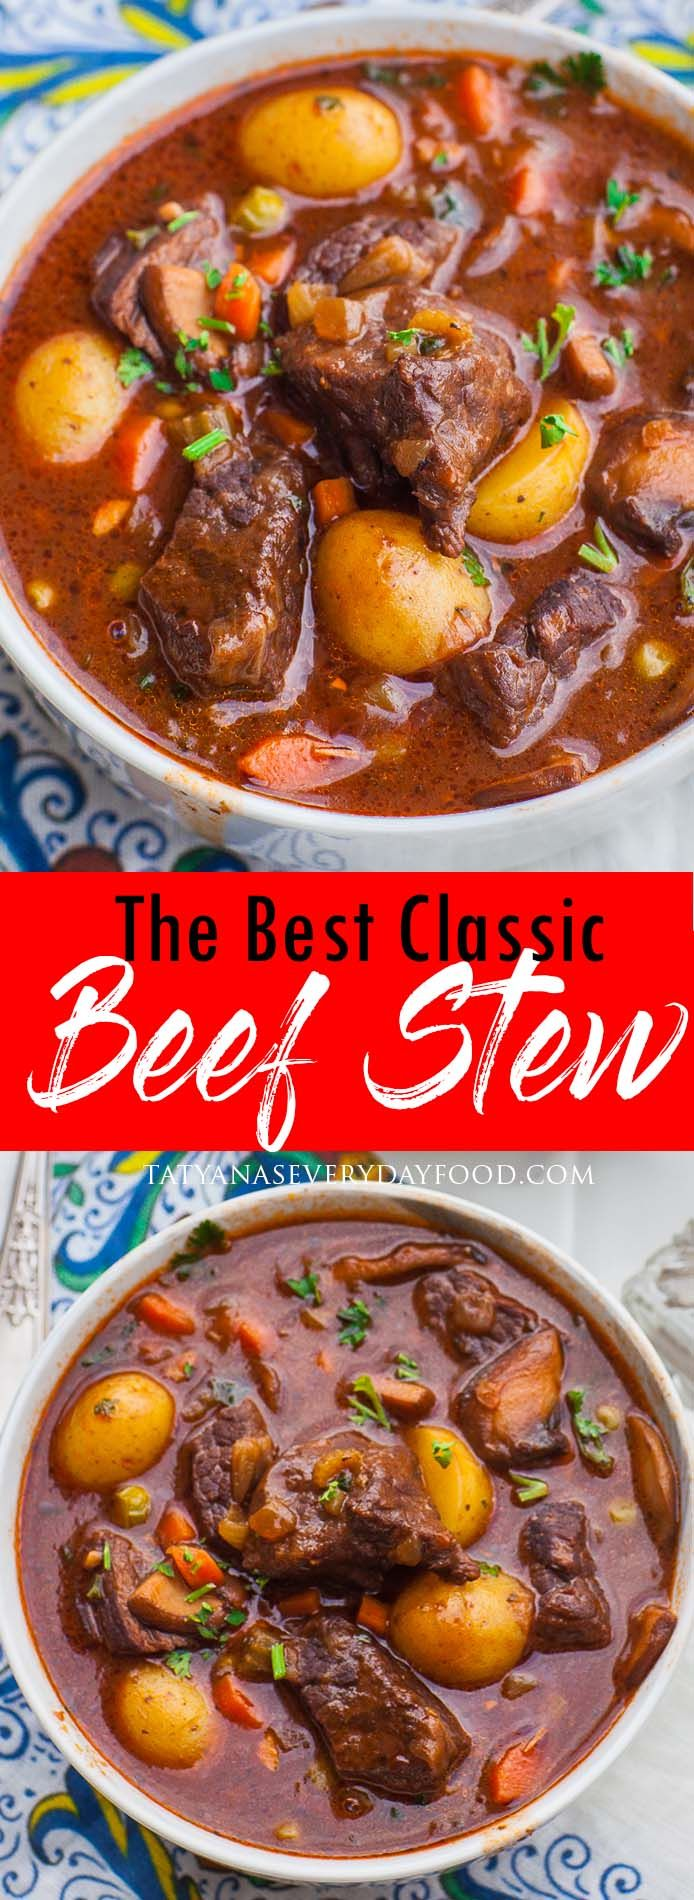 The Best Ever Beef Stew Recipe Video Tatyanas Everyday Food Recipe Tatyana S Everyday Food Beef Stew Recipe Best Beef Stew Recipe